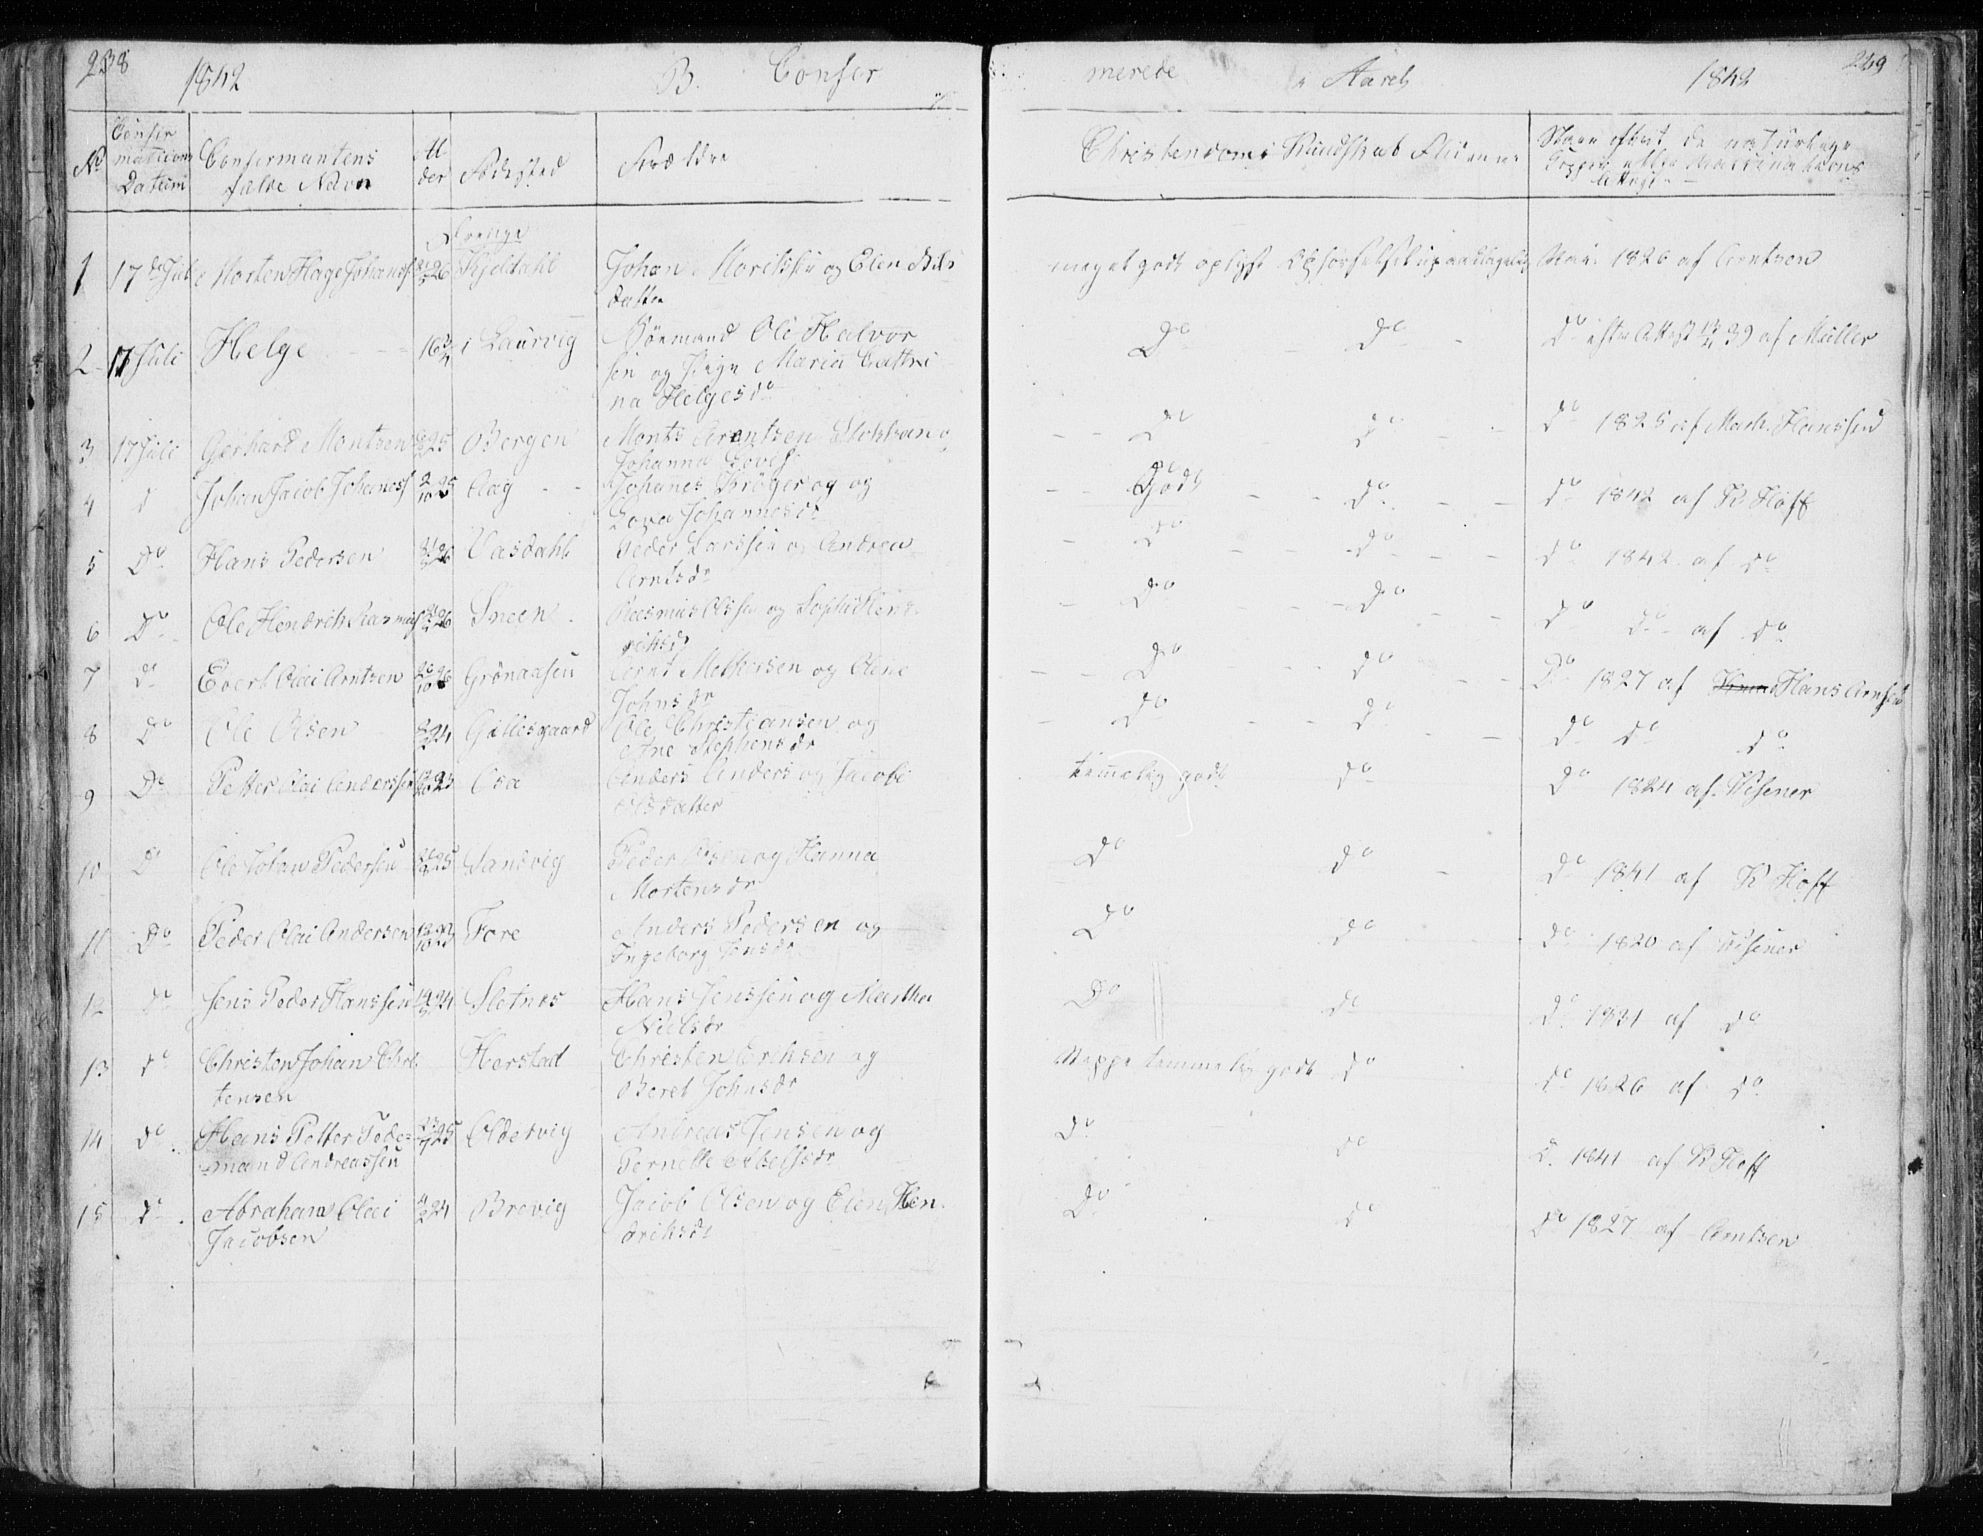 SAT, Ministerialprotokoller, klokkerbøker og fødselsregistre - Nordland, 843/L0632: Klokkerbok nr. 843C01, 1833-1853, s. 238-239